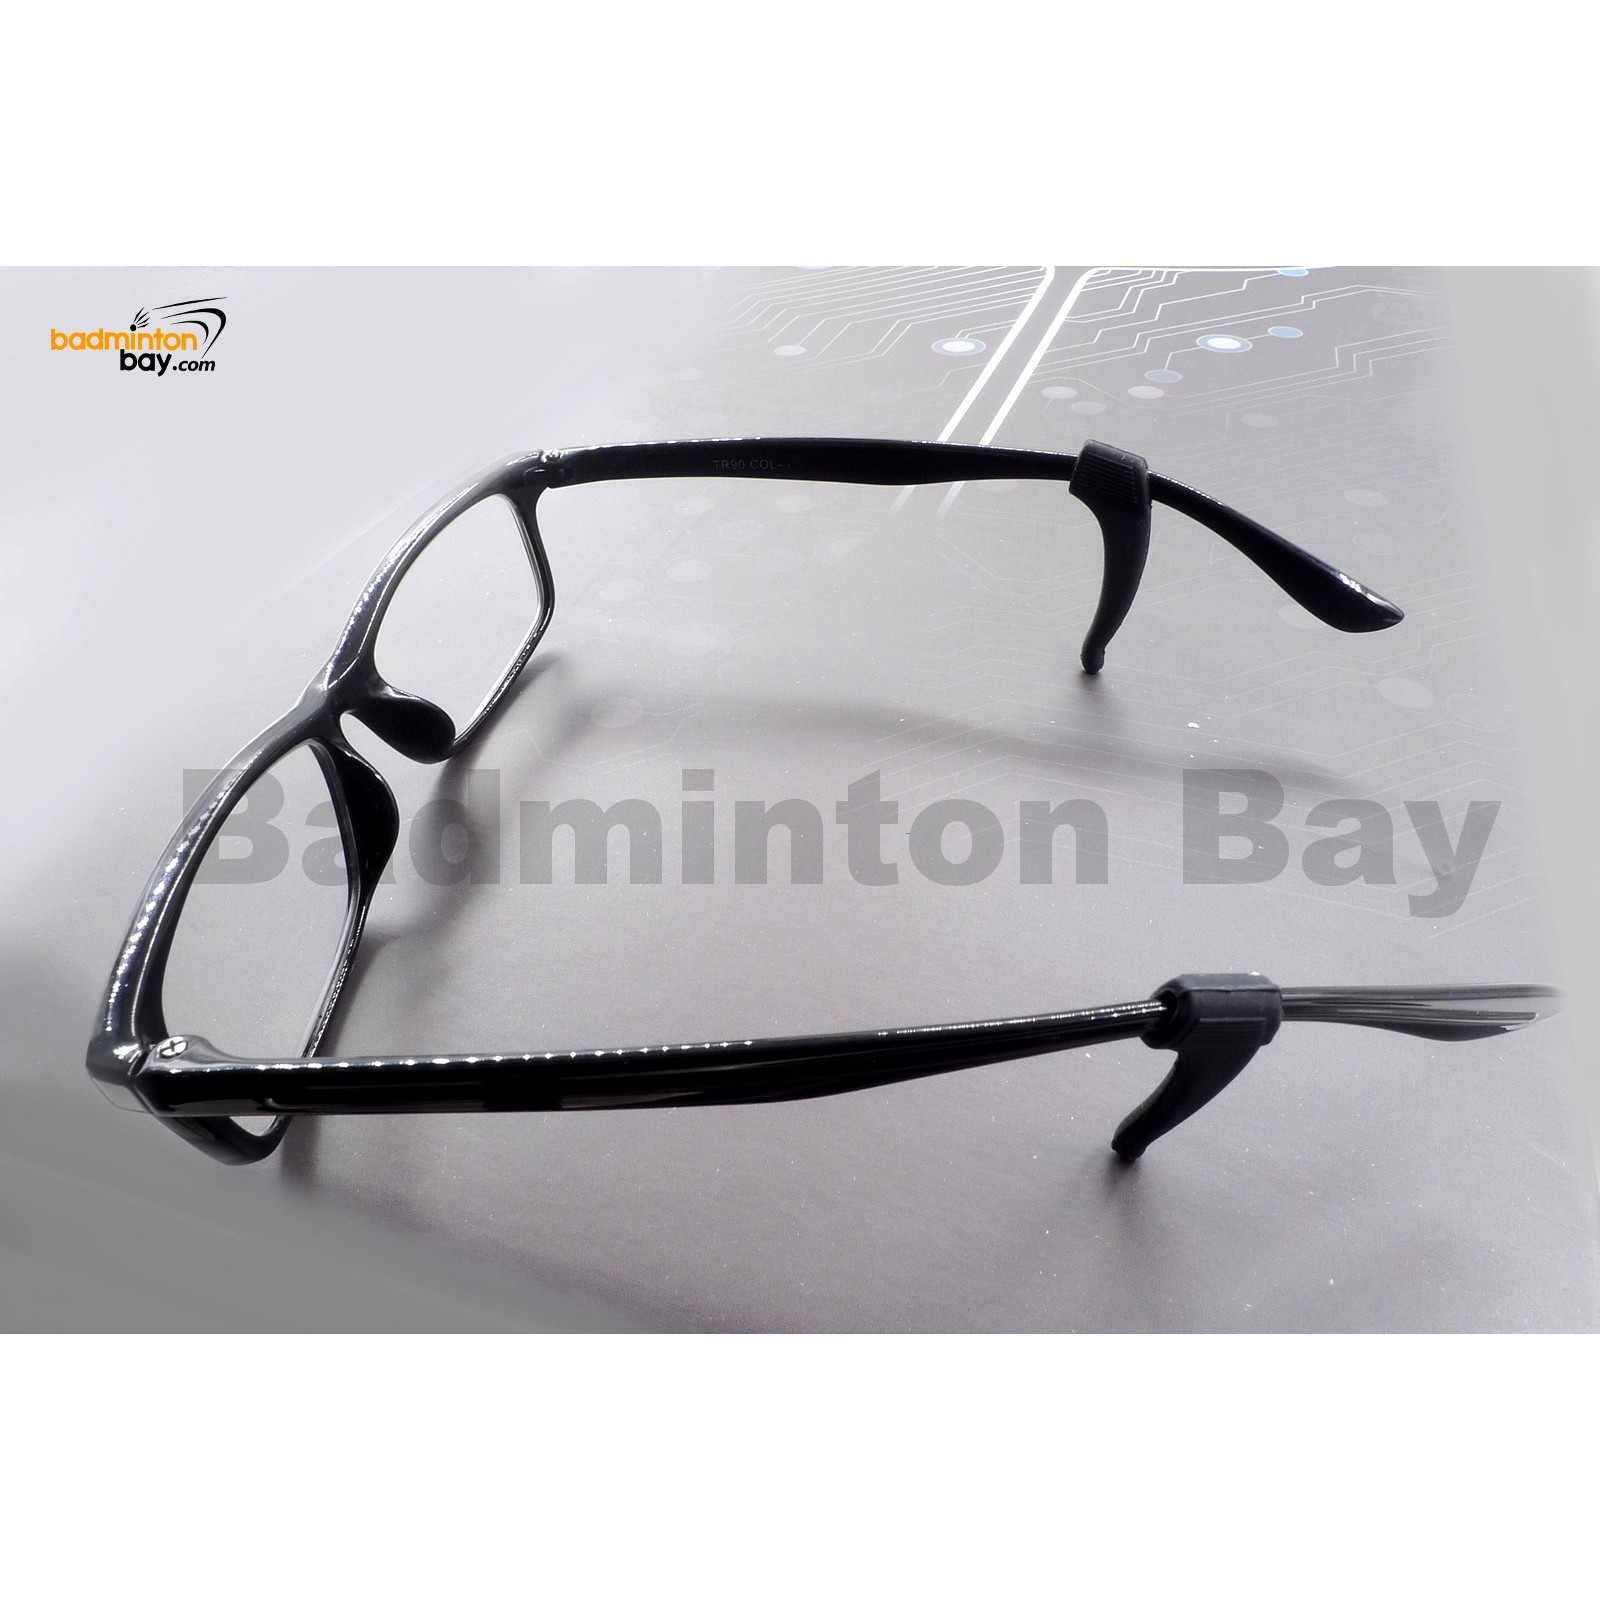 f0b0dc07cc01 Abroz Sports Silicone Eye Glasses Ear Hooks Grip Anti Slip Temple Tips (4  Pairs)